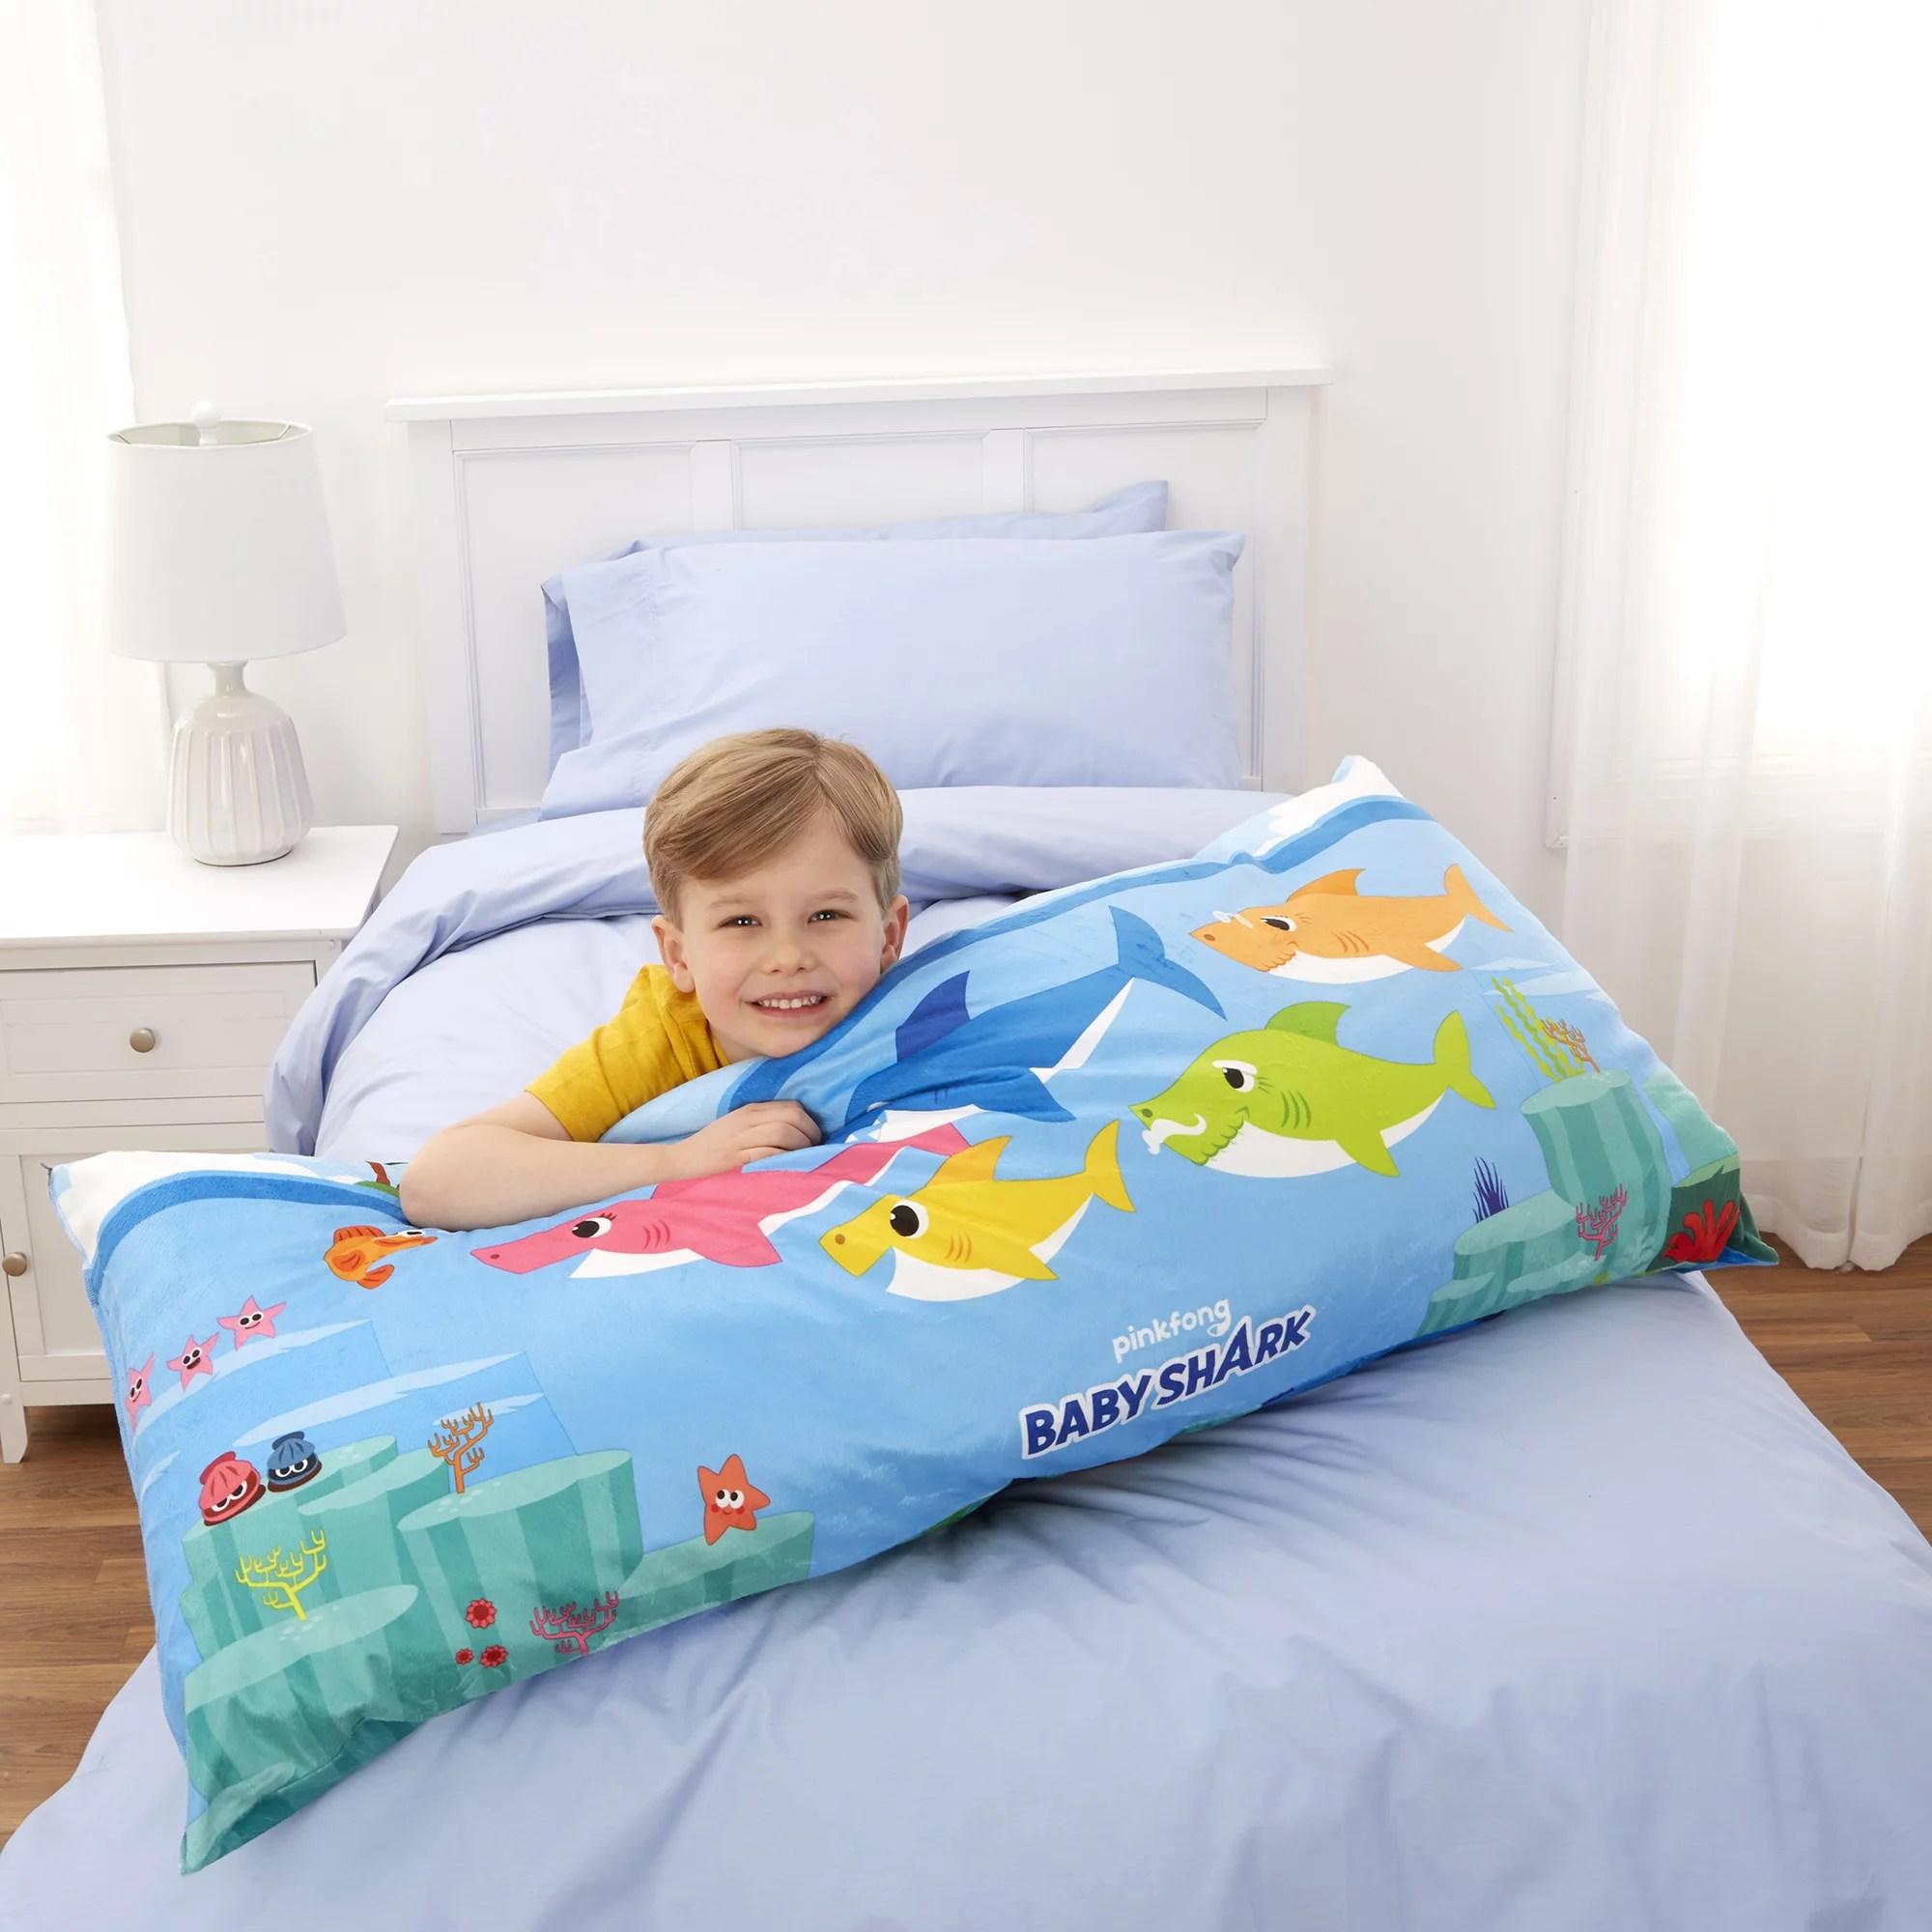 baby shark extra large body pillow reversible design 4 feet long